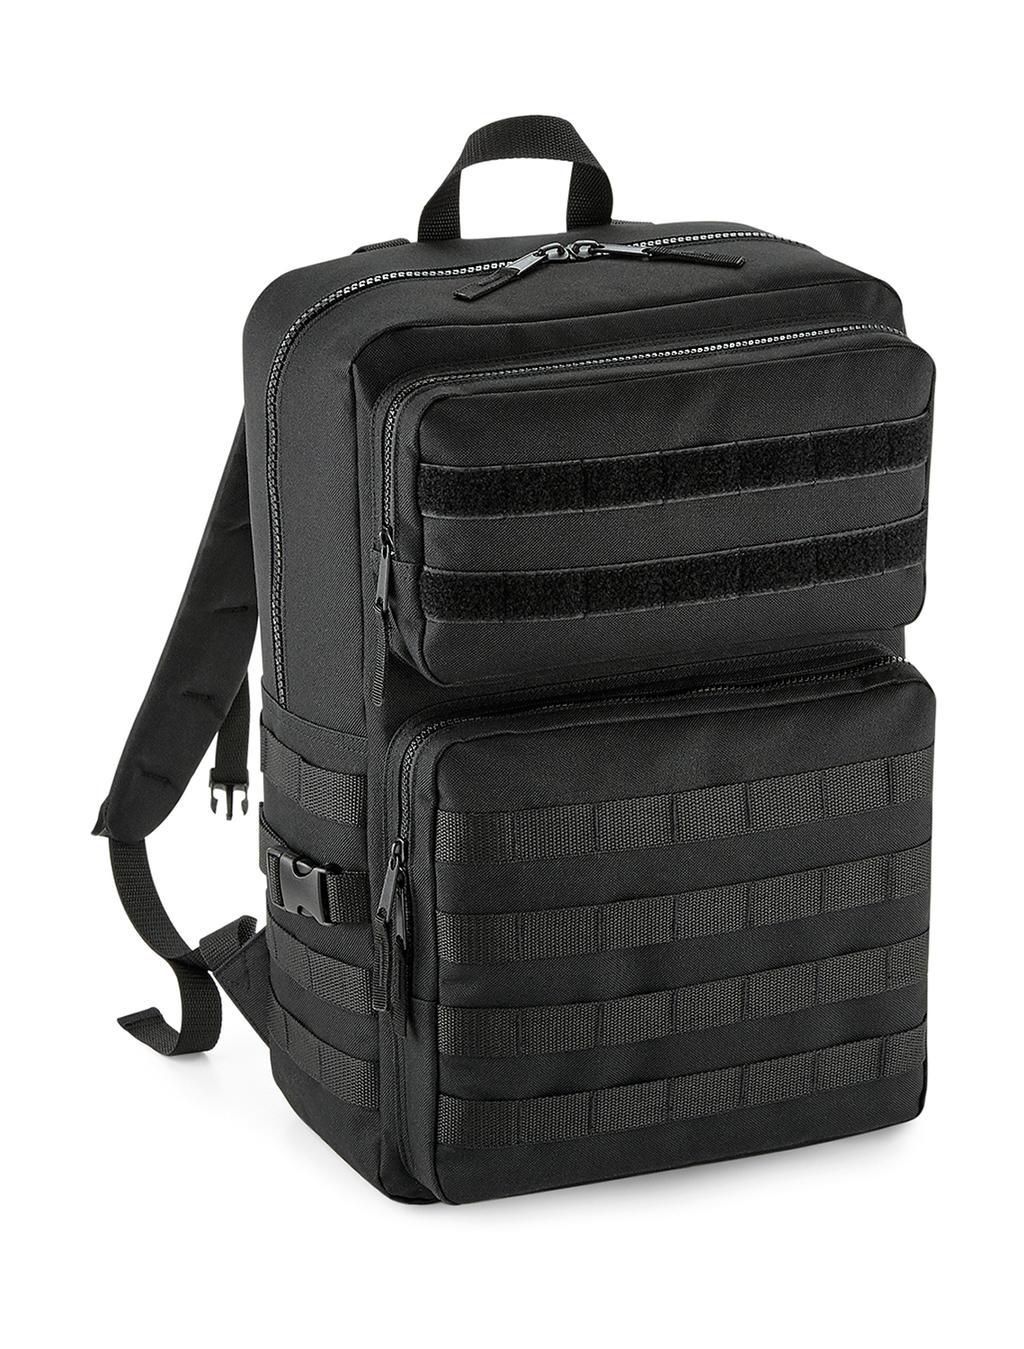 MOLLE Tactical Backpack - zvìtšit obrázek